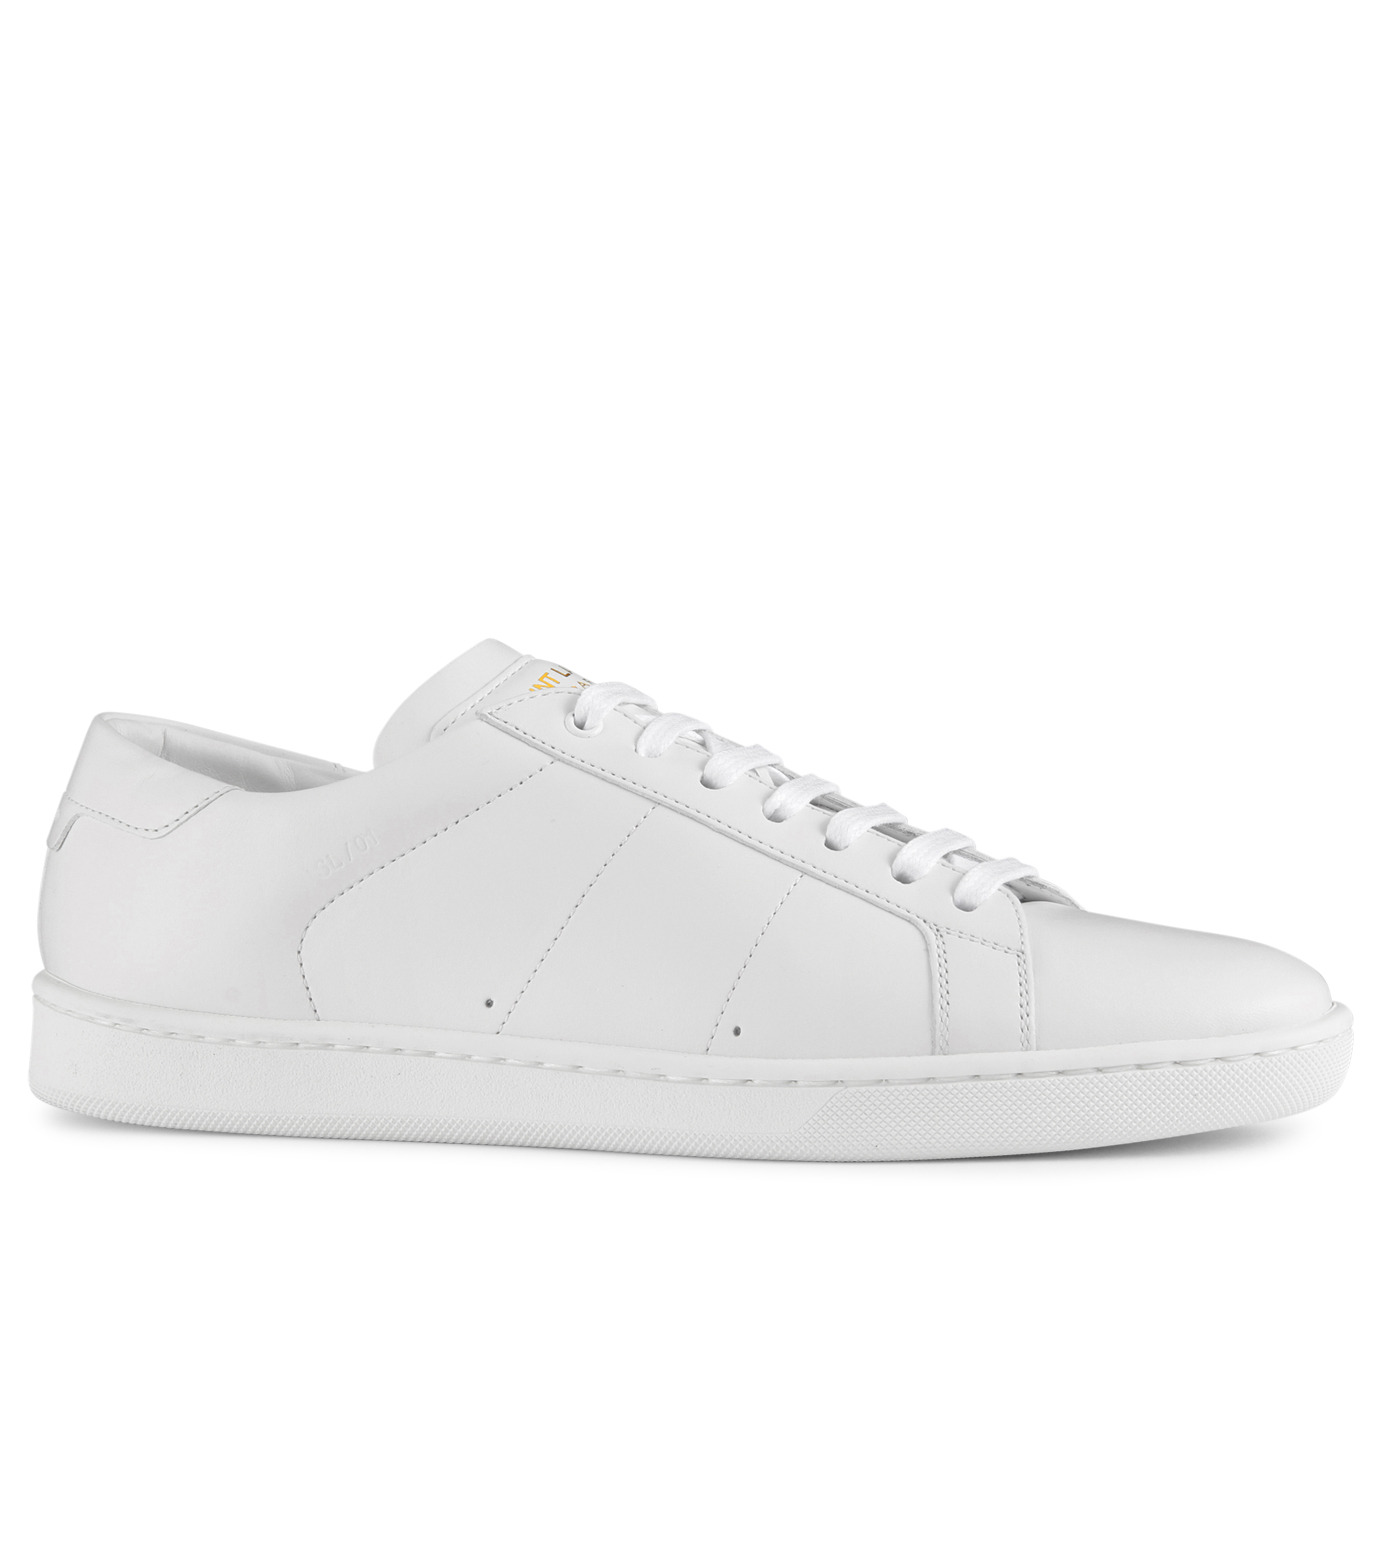 SAINT LAURENT(サンローラン)のLow Top Sneaker-WHITE-336250-AQI00-4 拡大詳細画像1